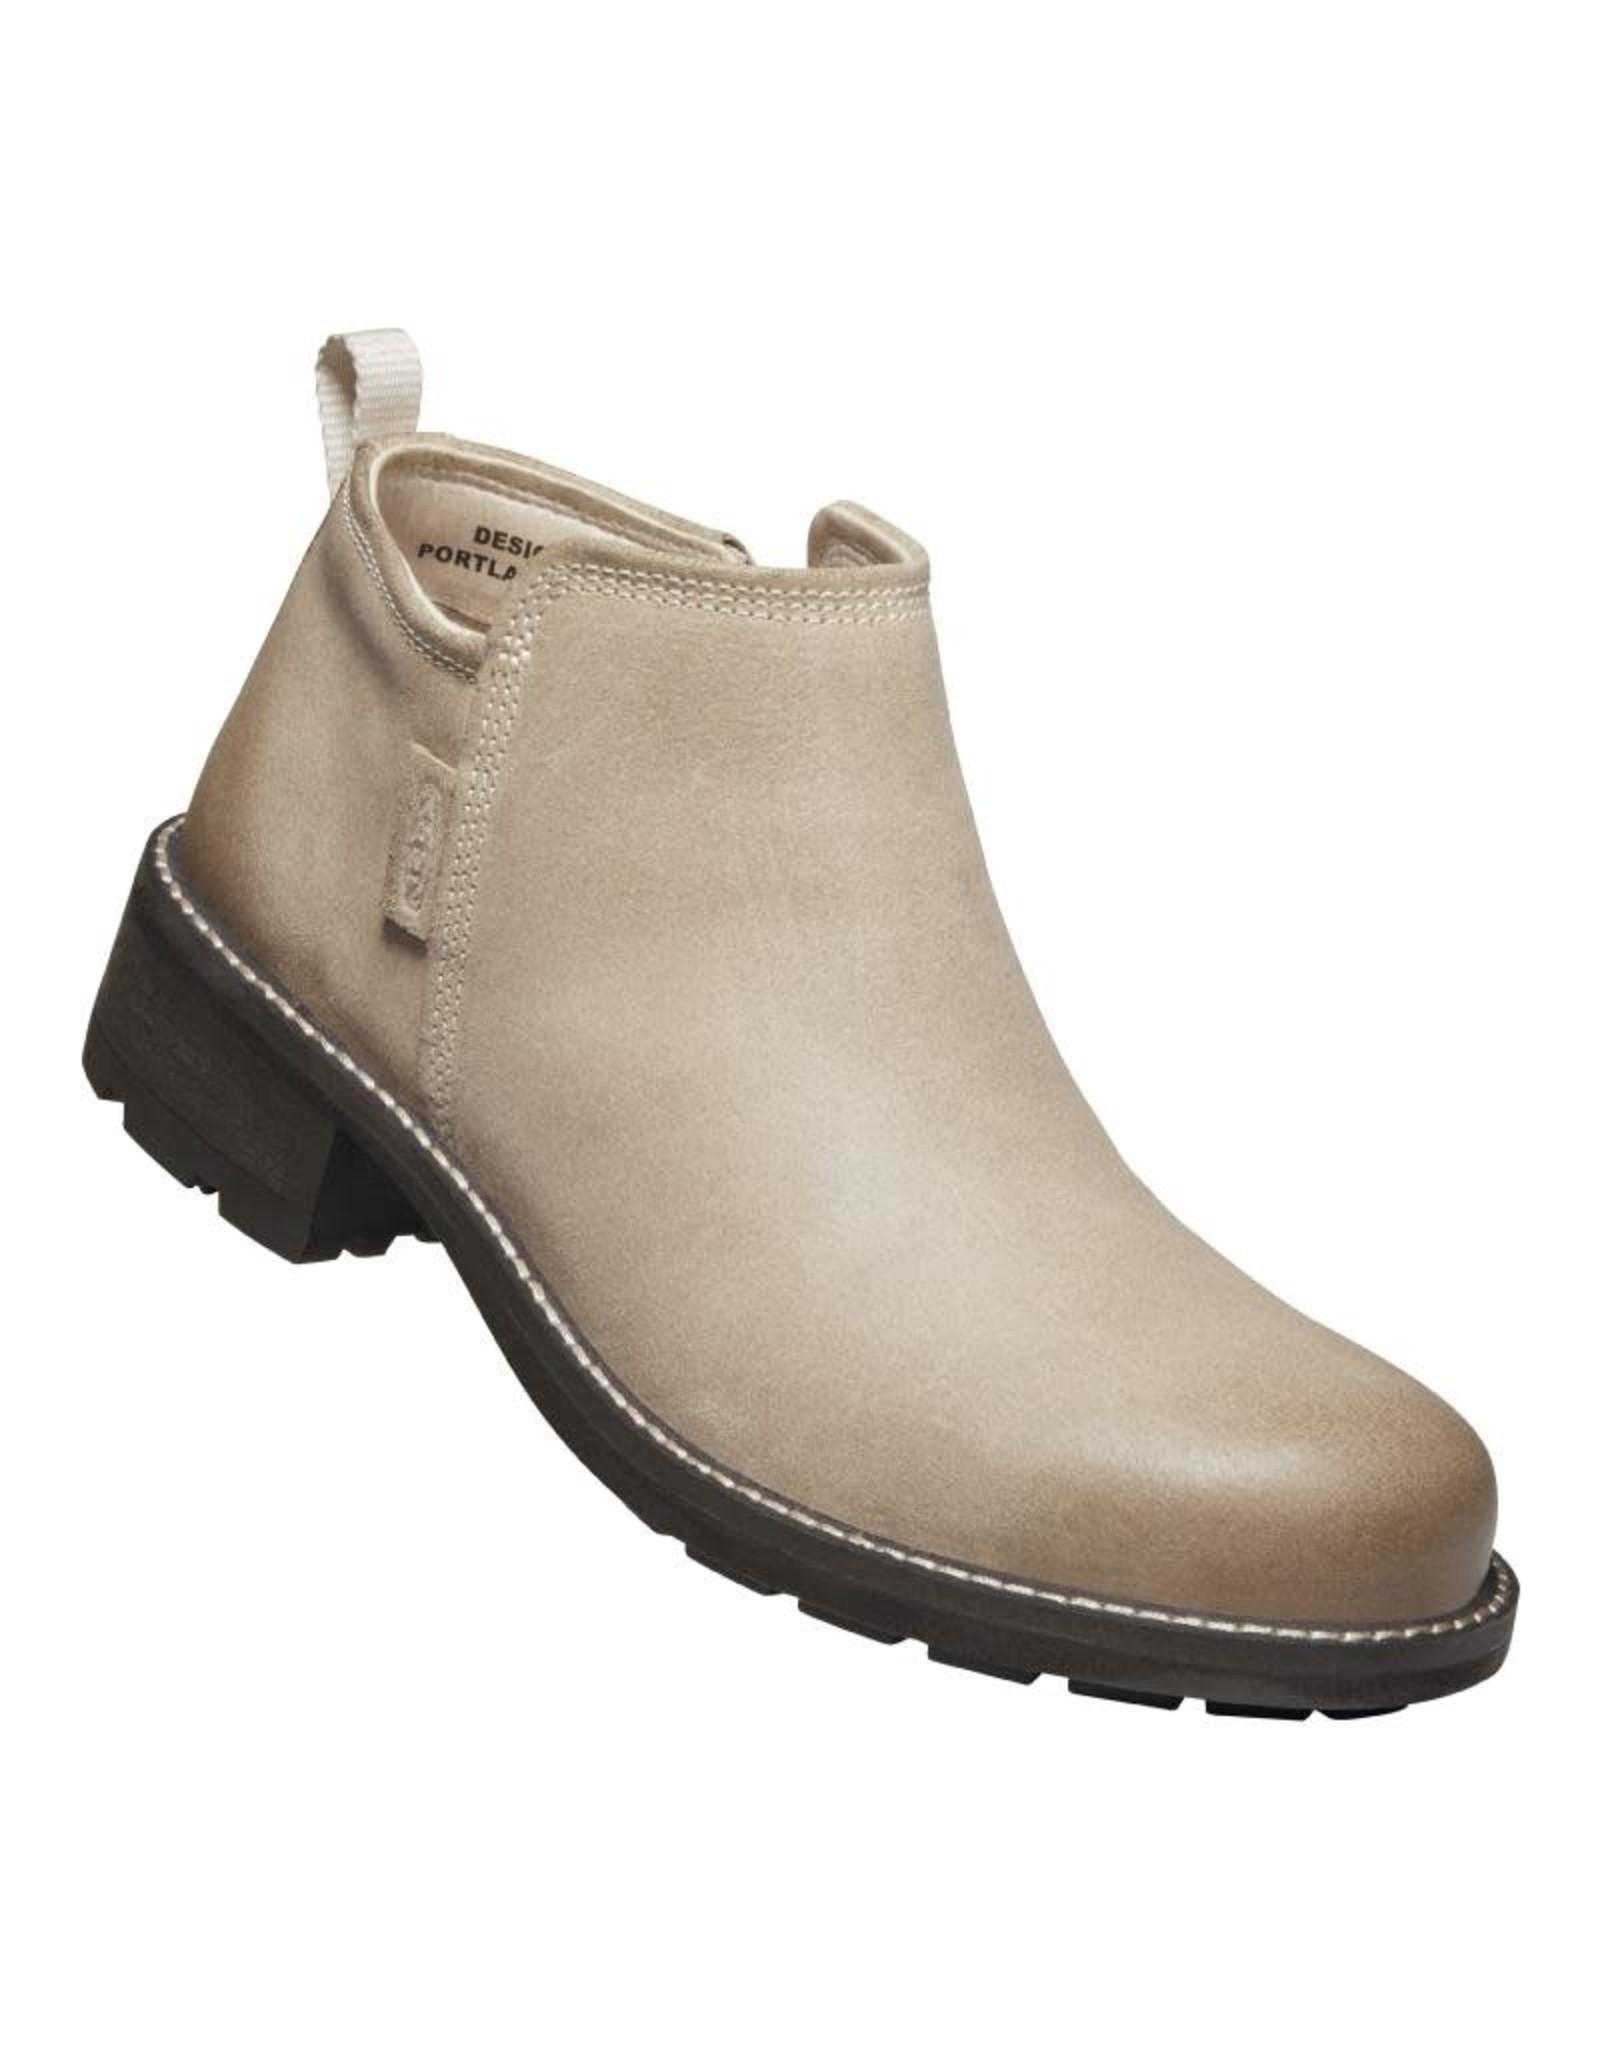 Keen Women's Oregon City Low Boot